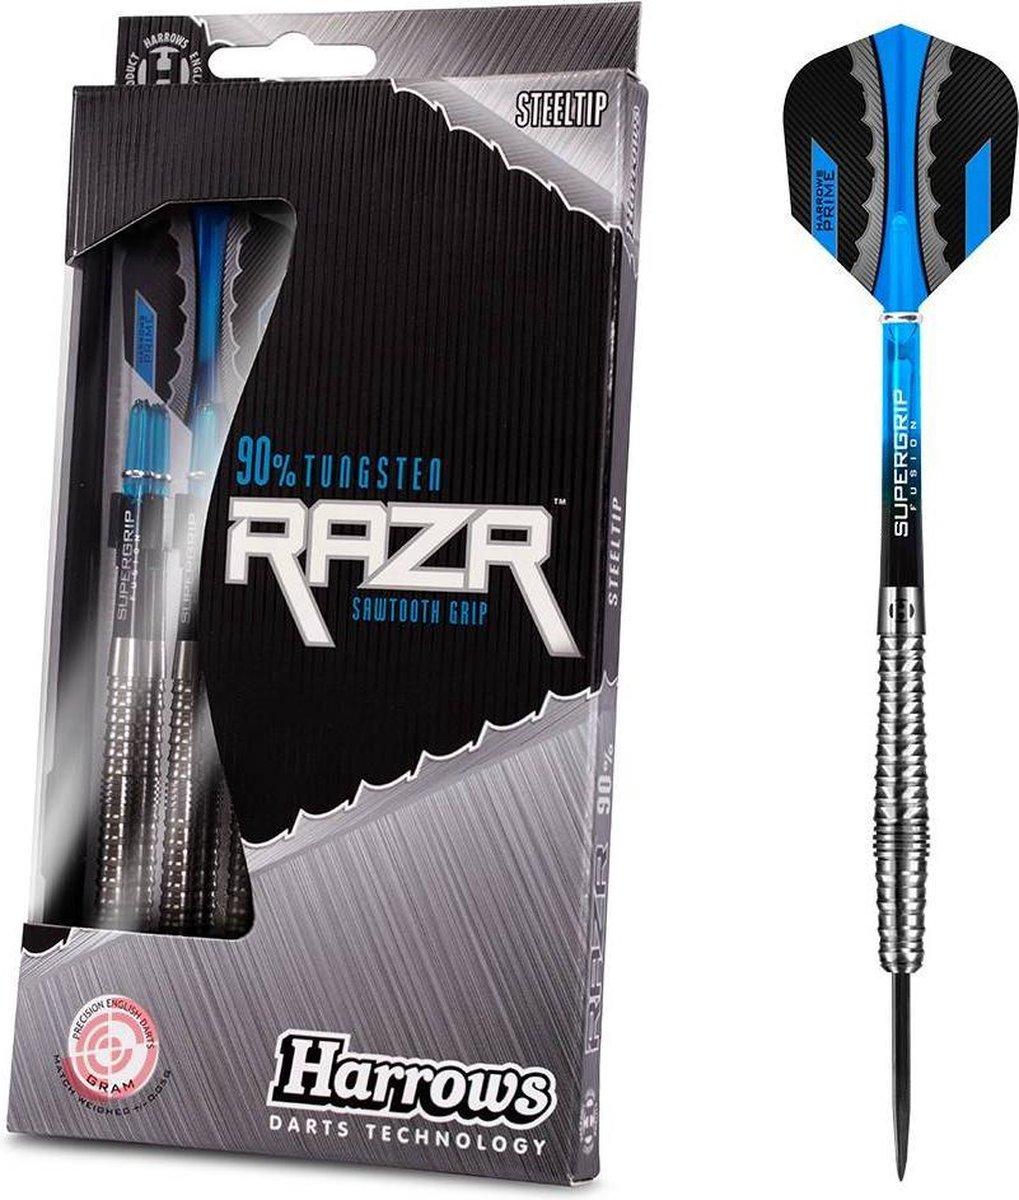 Harrows Razr Bulbous 90% - 24 Gram